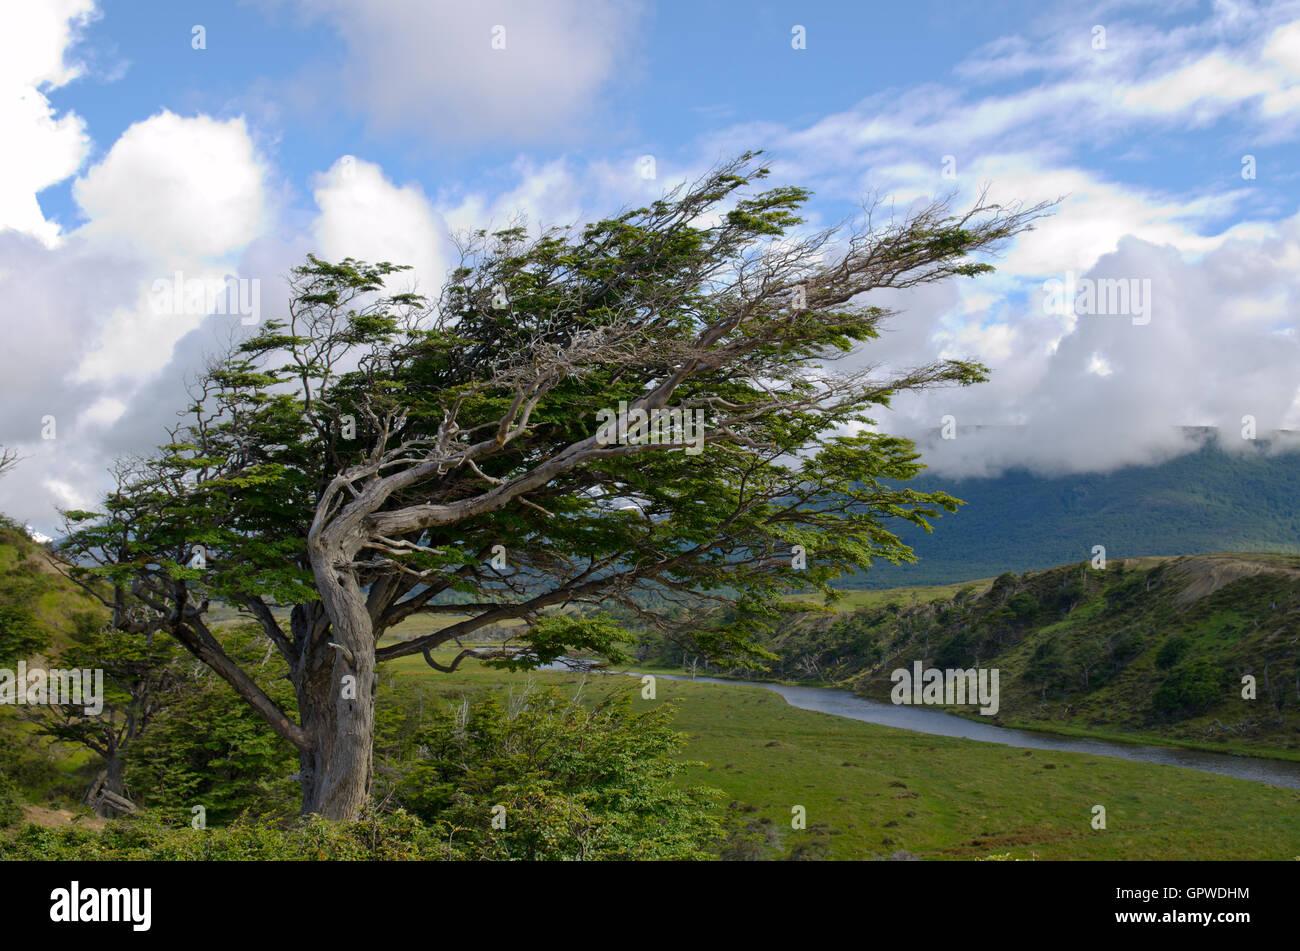 Wind-bent tree in Fireland (Tierra Del Fuego), Patagonia, Argent - Stock Image